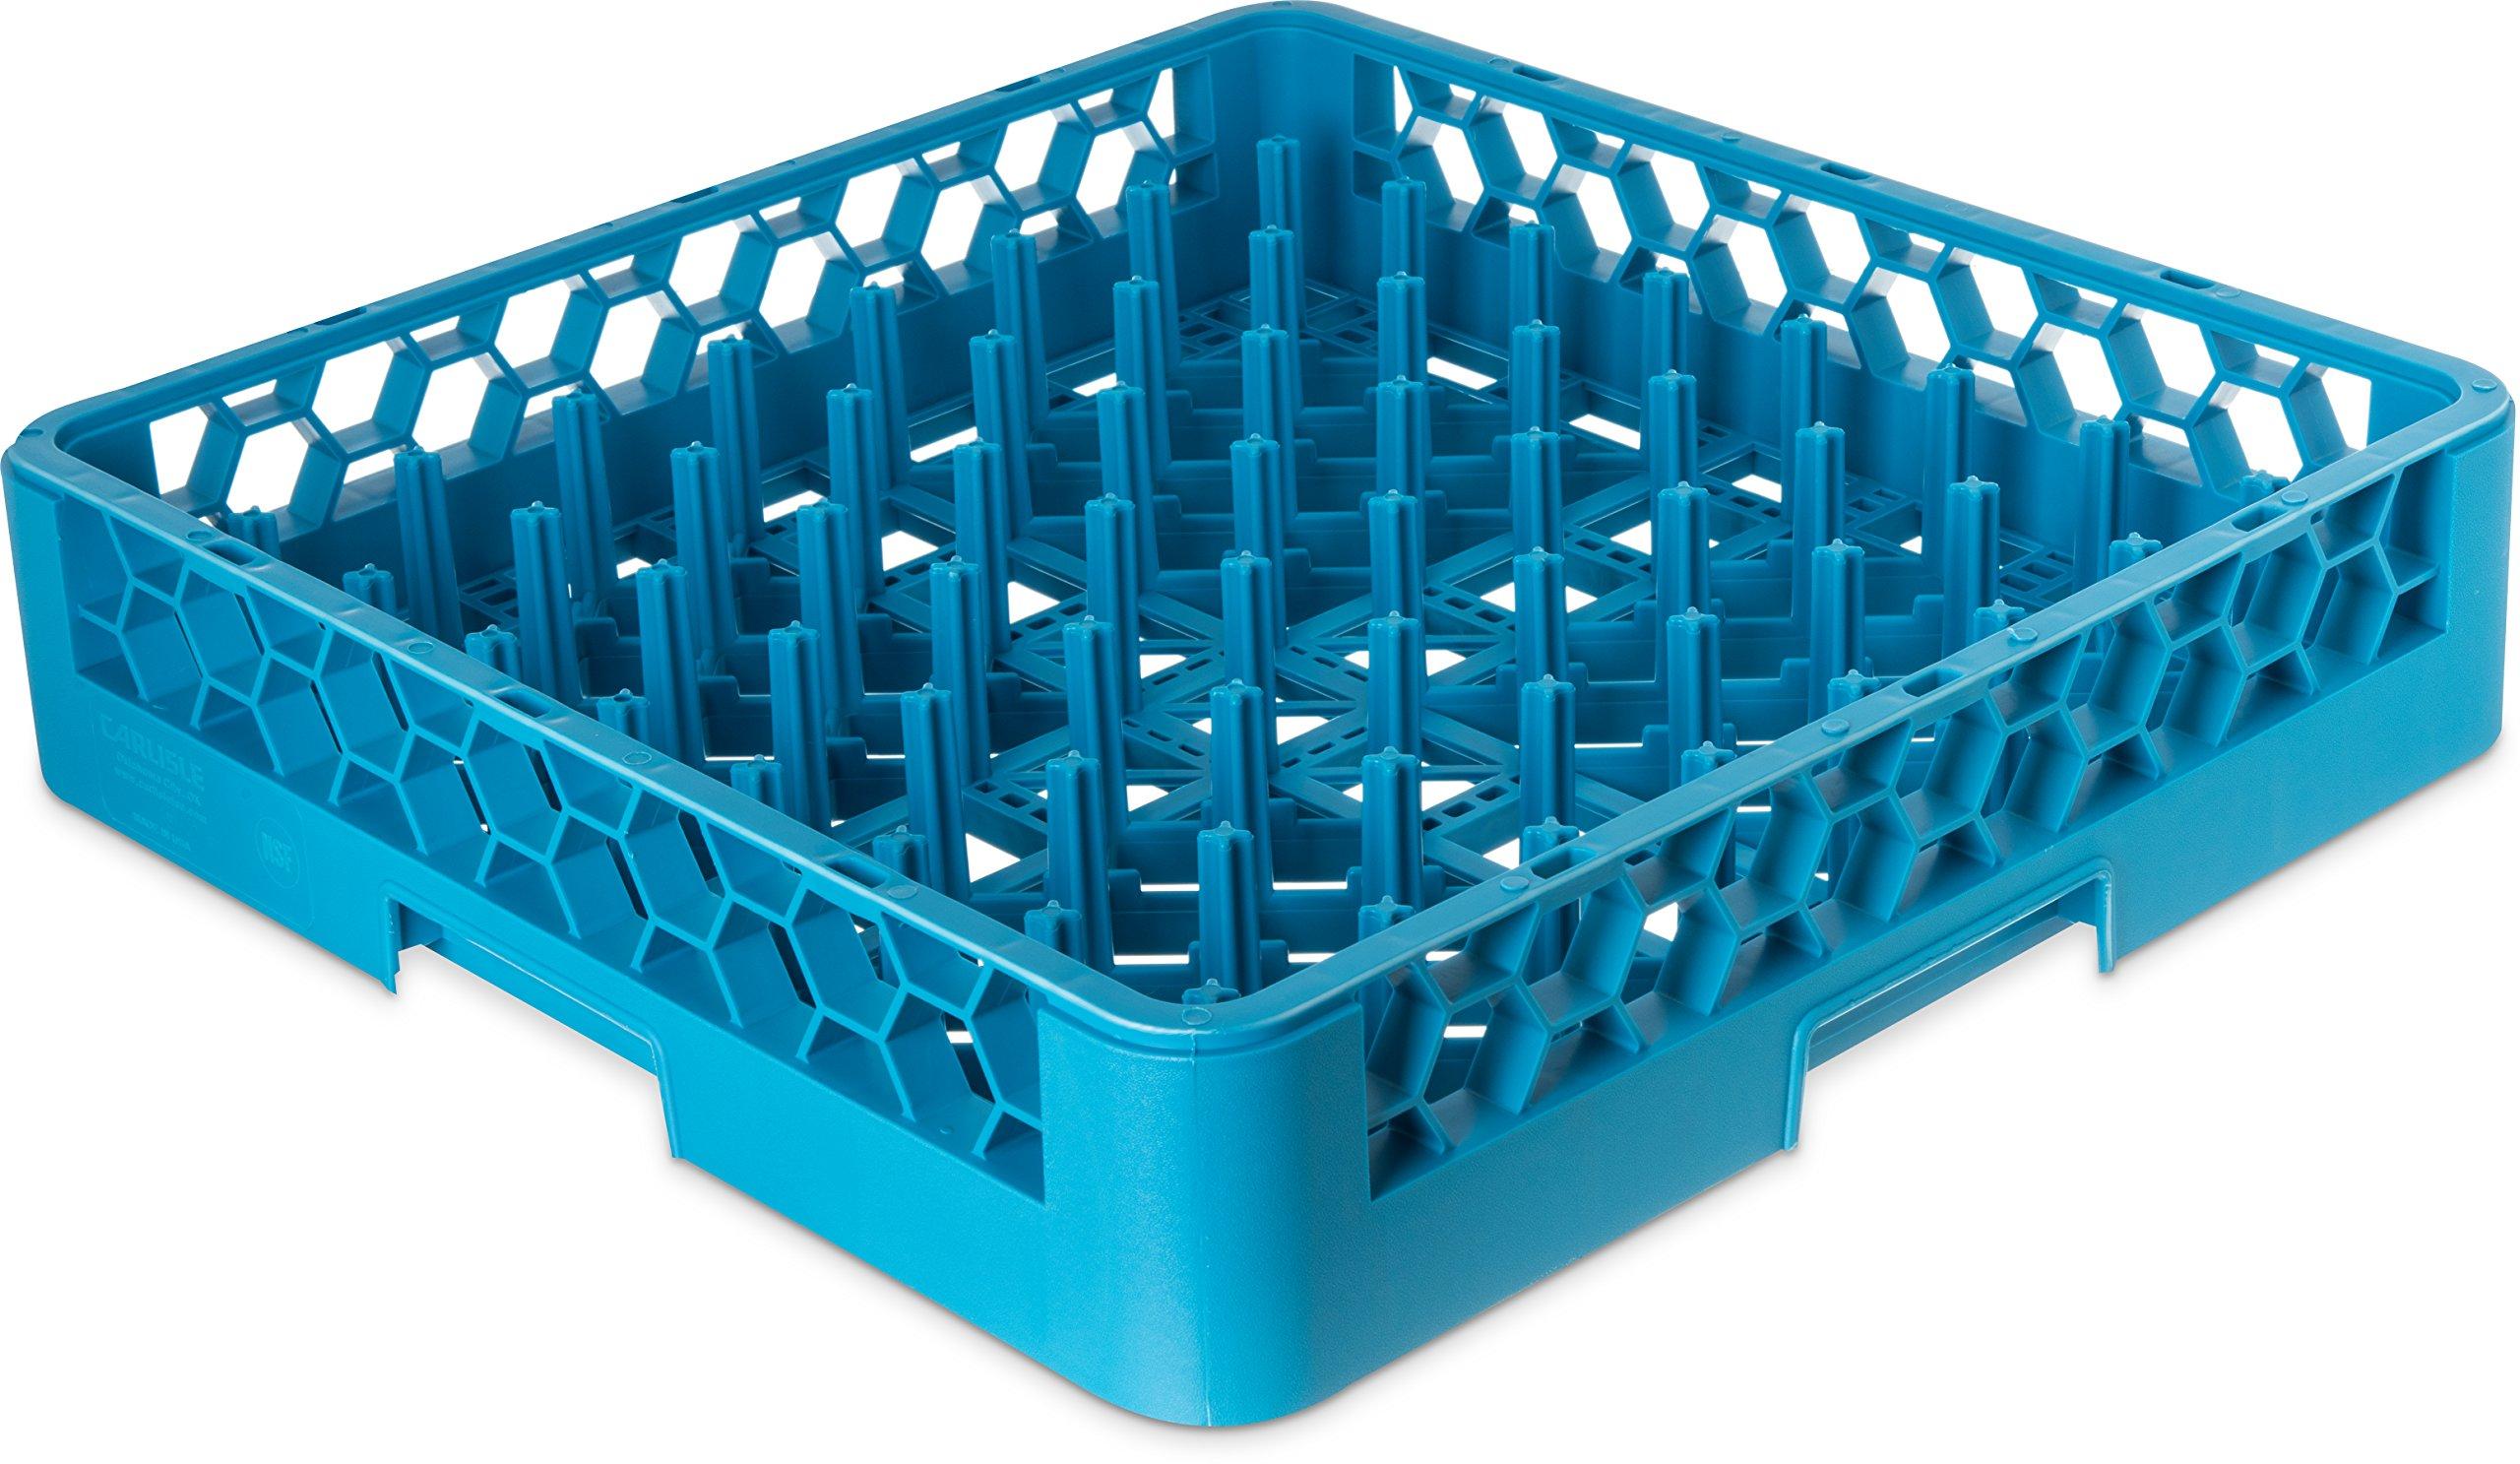 Carlisle RP14 OptiClean All-Purpose Plate & Tray Rack, Polypropylene, 20.75'' Length, 20.50'' Width, 4.00'' Height, Blue (Case of 6)